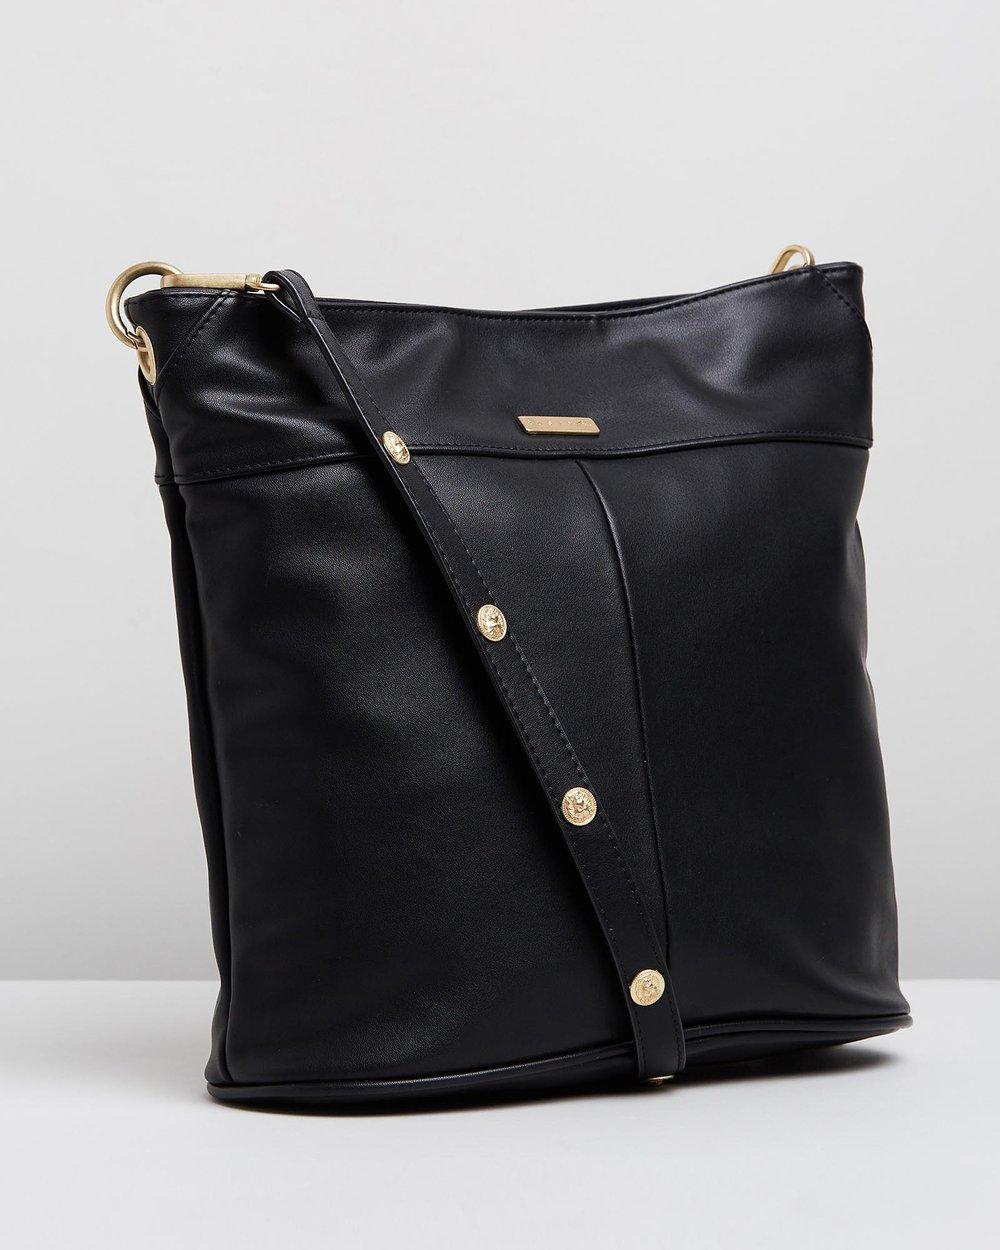 f148f0208f Stevie Handbag by Rusty Online